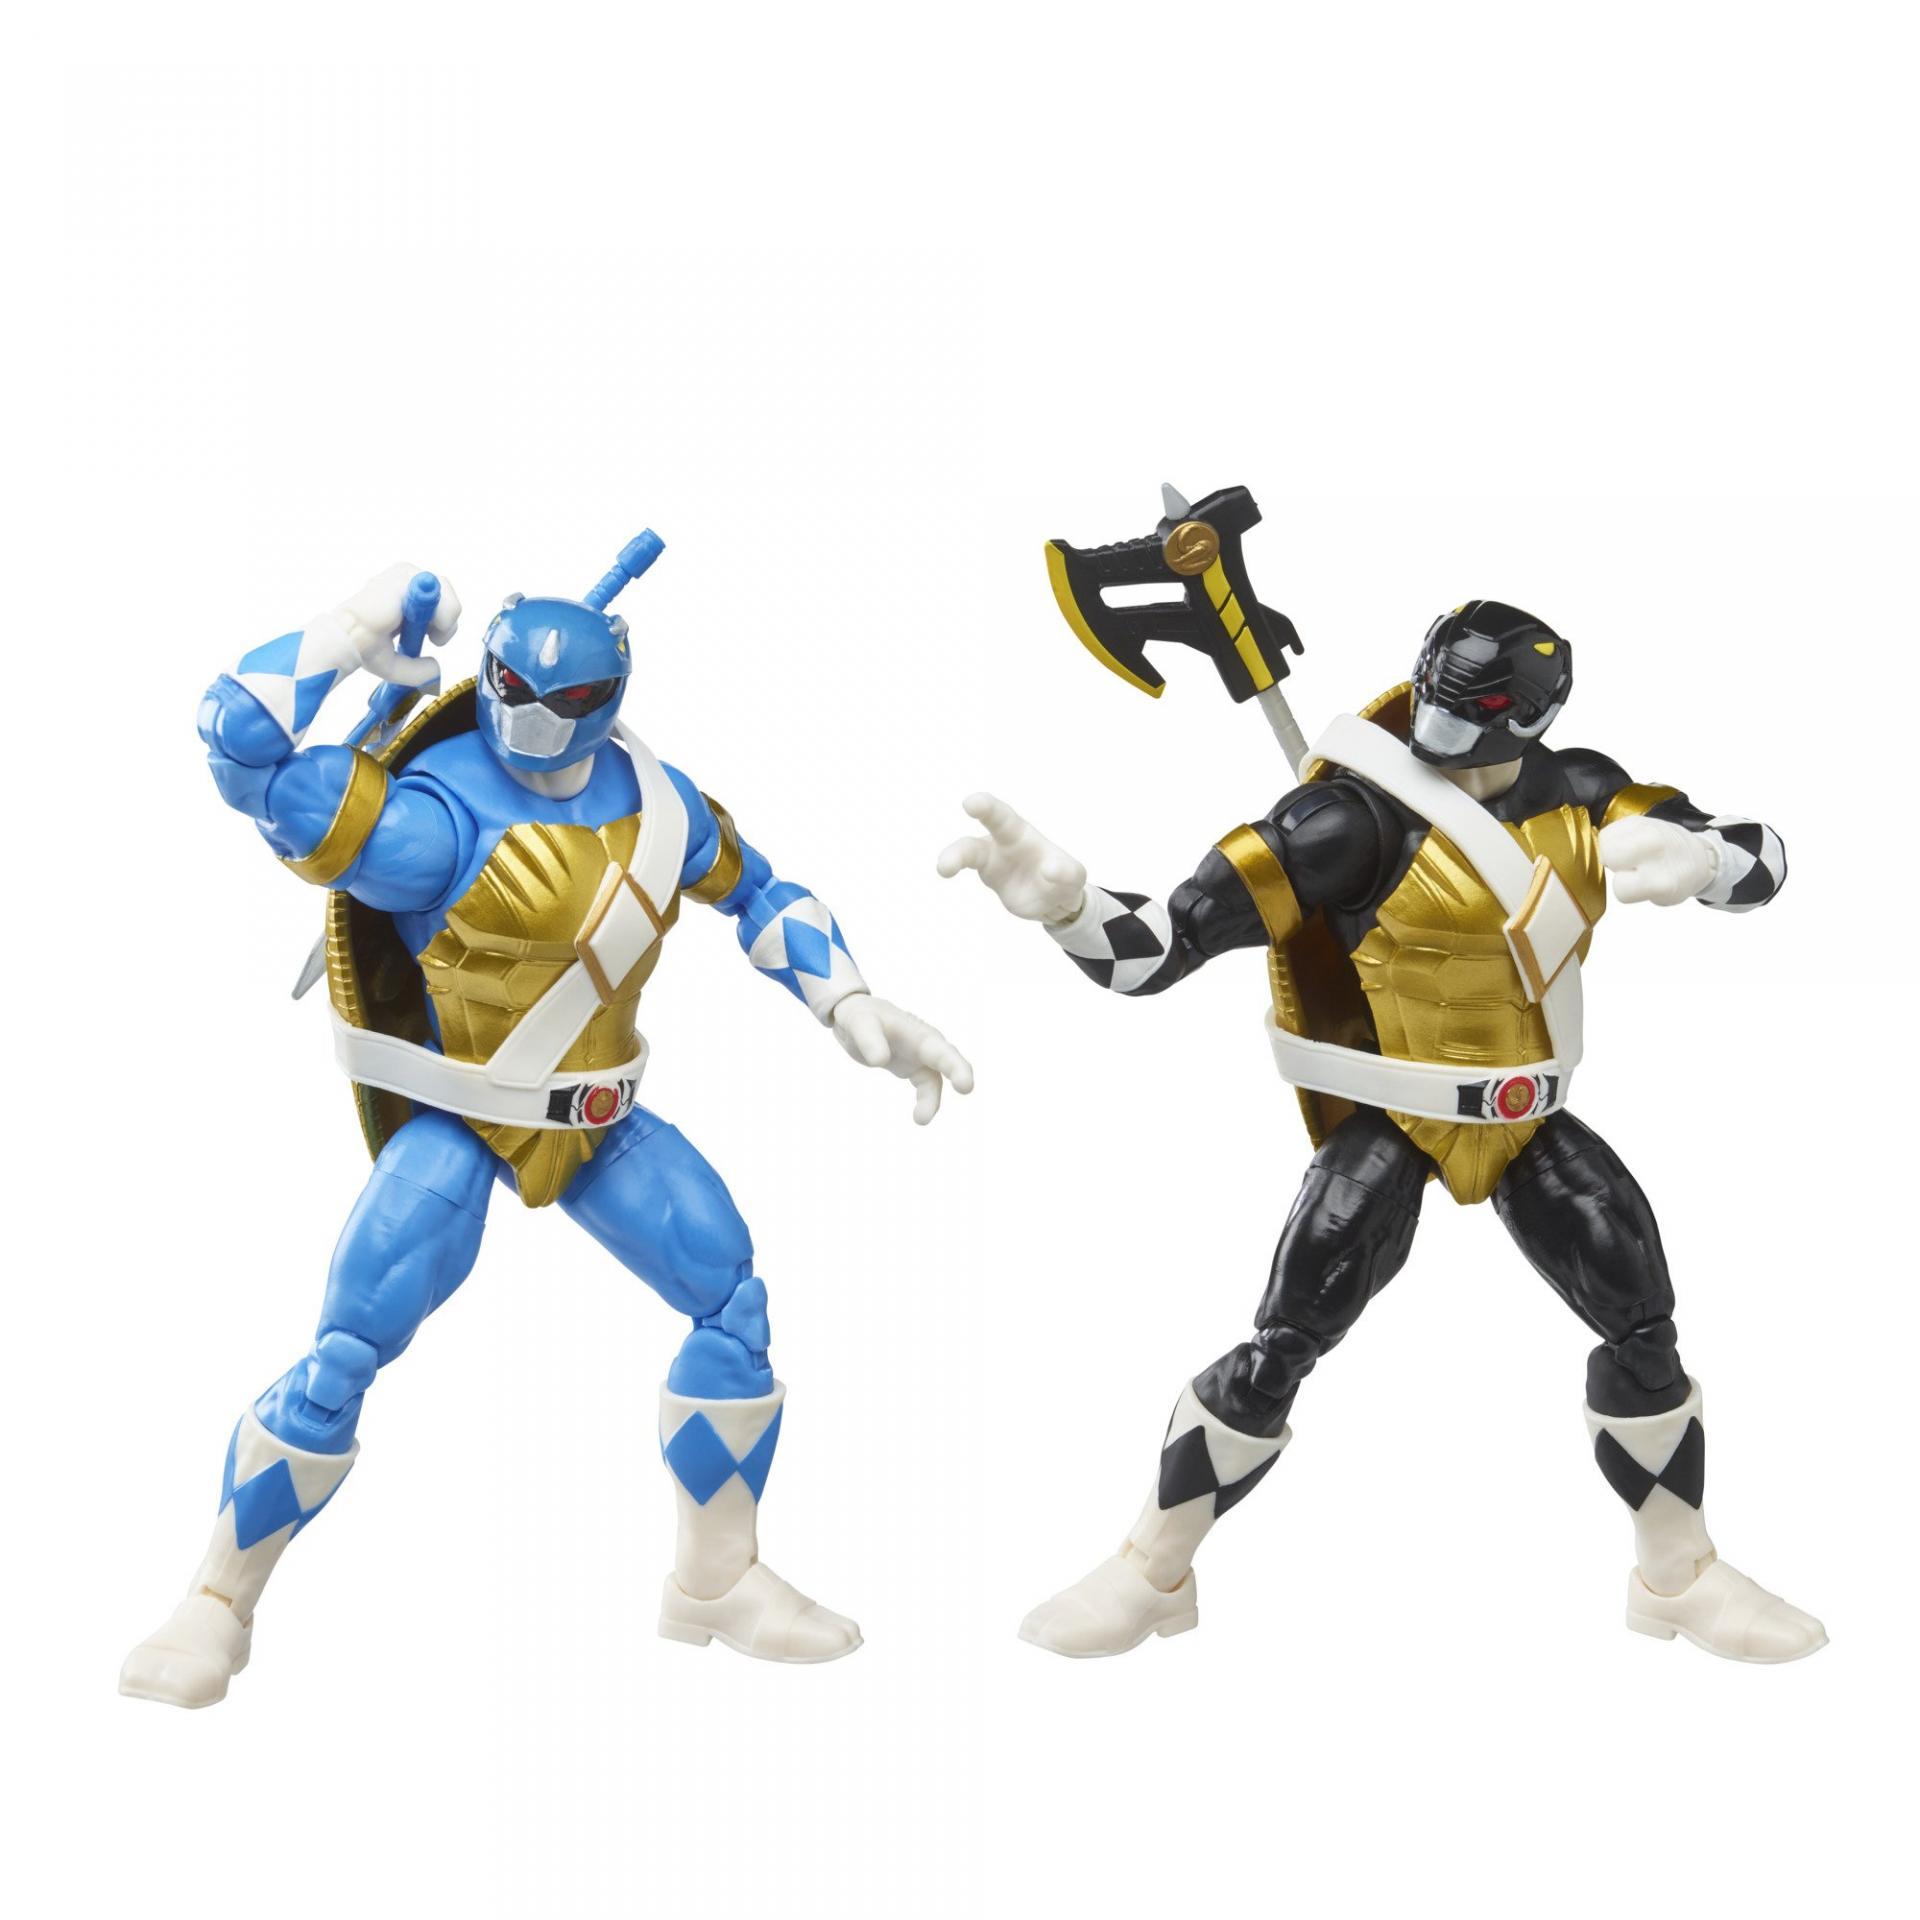 Power rangers tortue ninja tmnt lightning collection morphed donatello morphed leonardo 15cm3